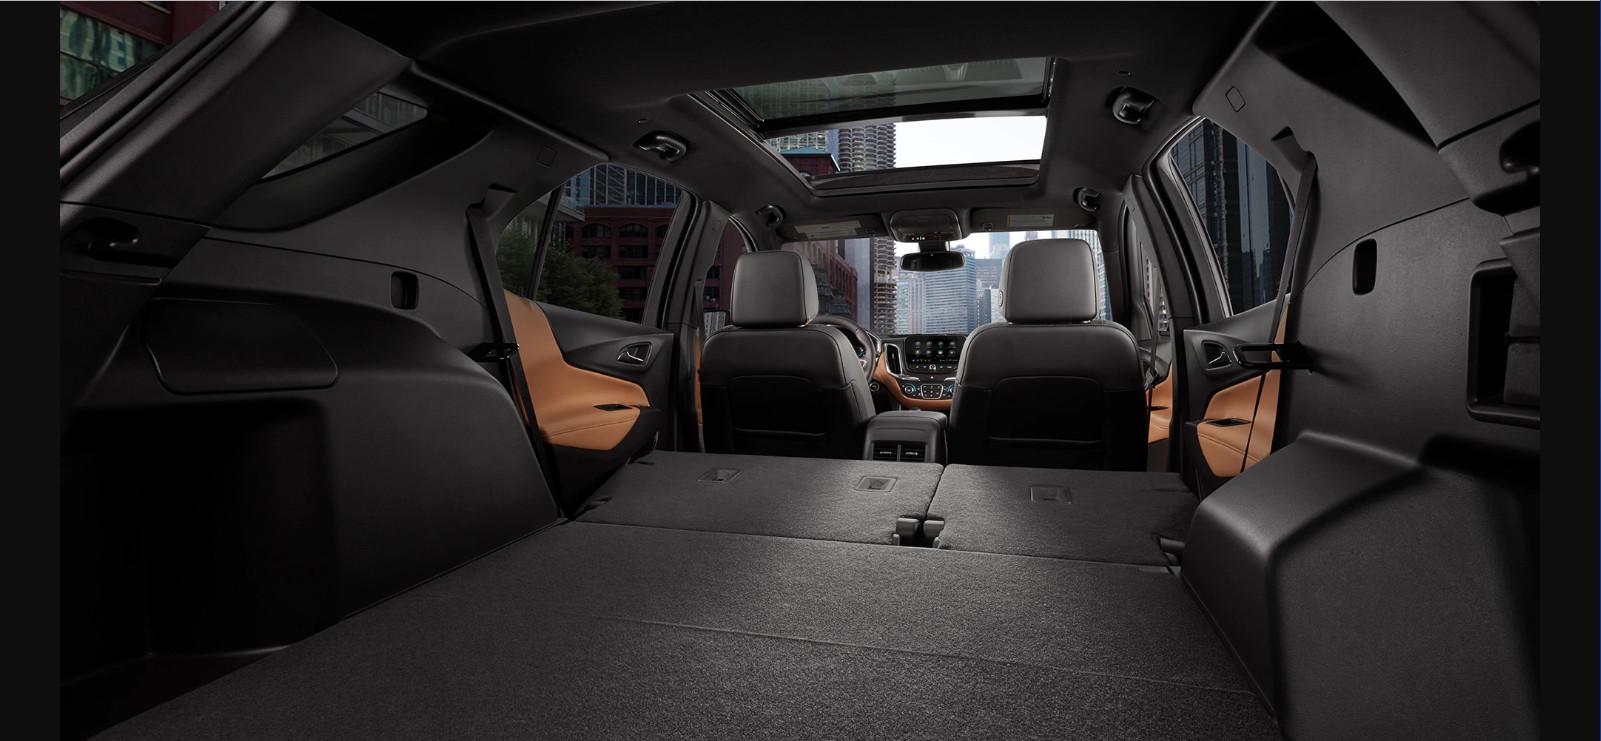 2020 Chevrolet Equinox Cargo